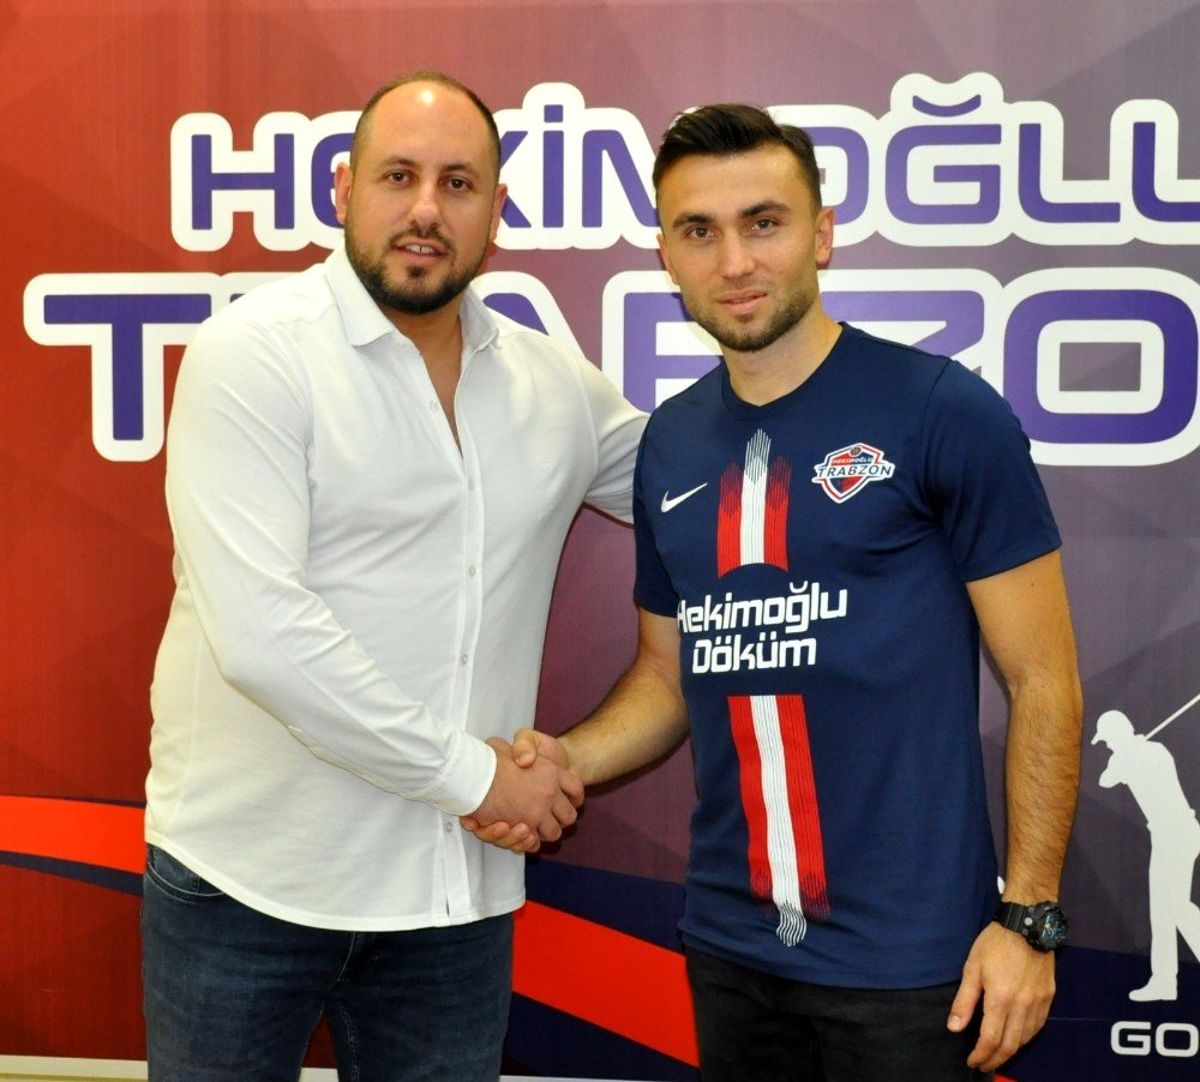 Hekimoğlu Trabzon, Abdulkadir Özdemir'i transfer etti - Trabzon